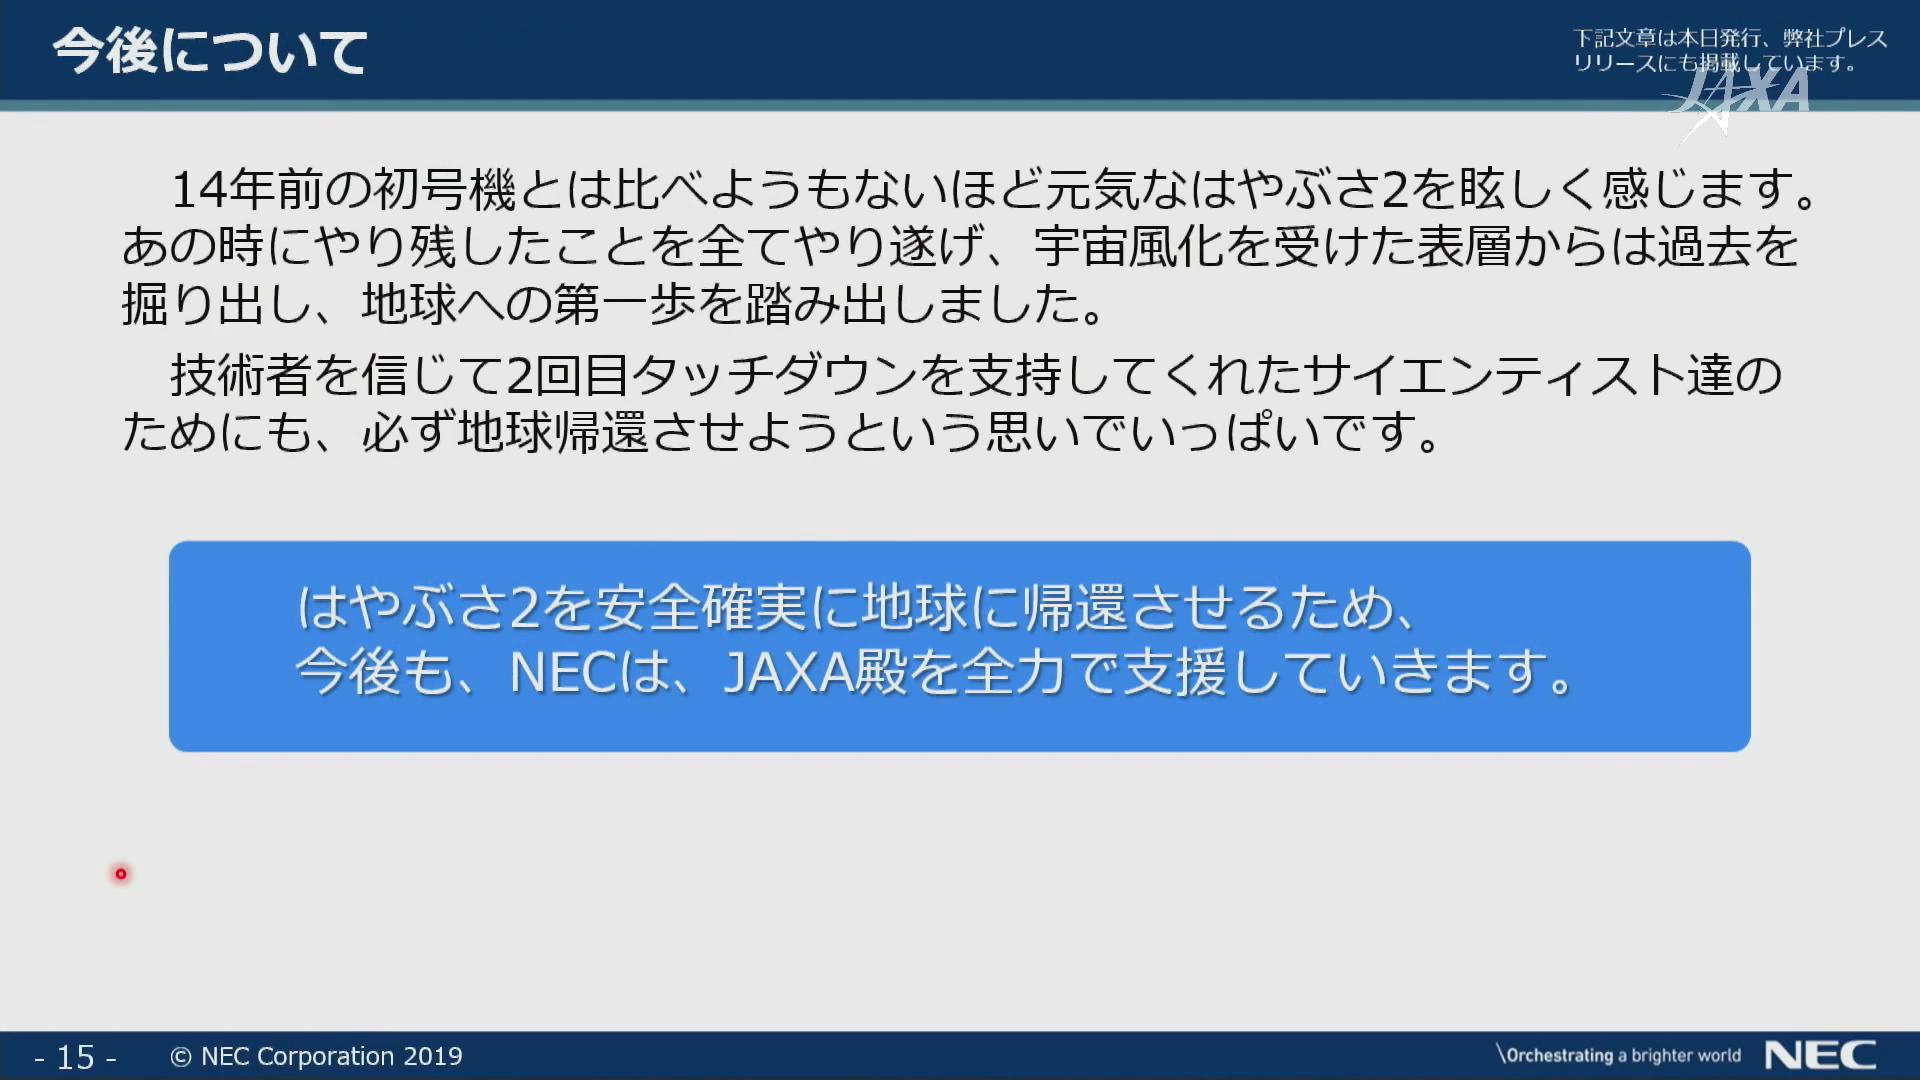 f:id:Imamura:20191219213641p:plain